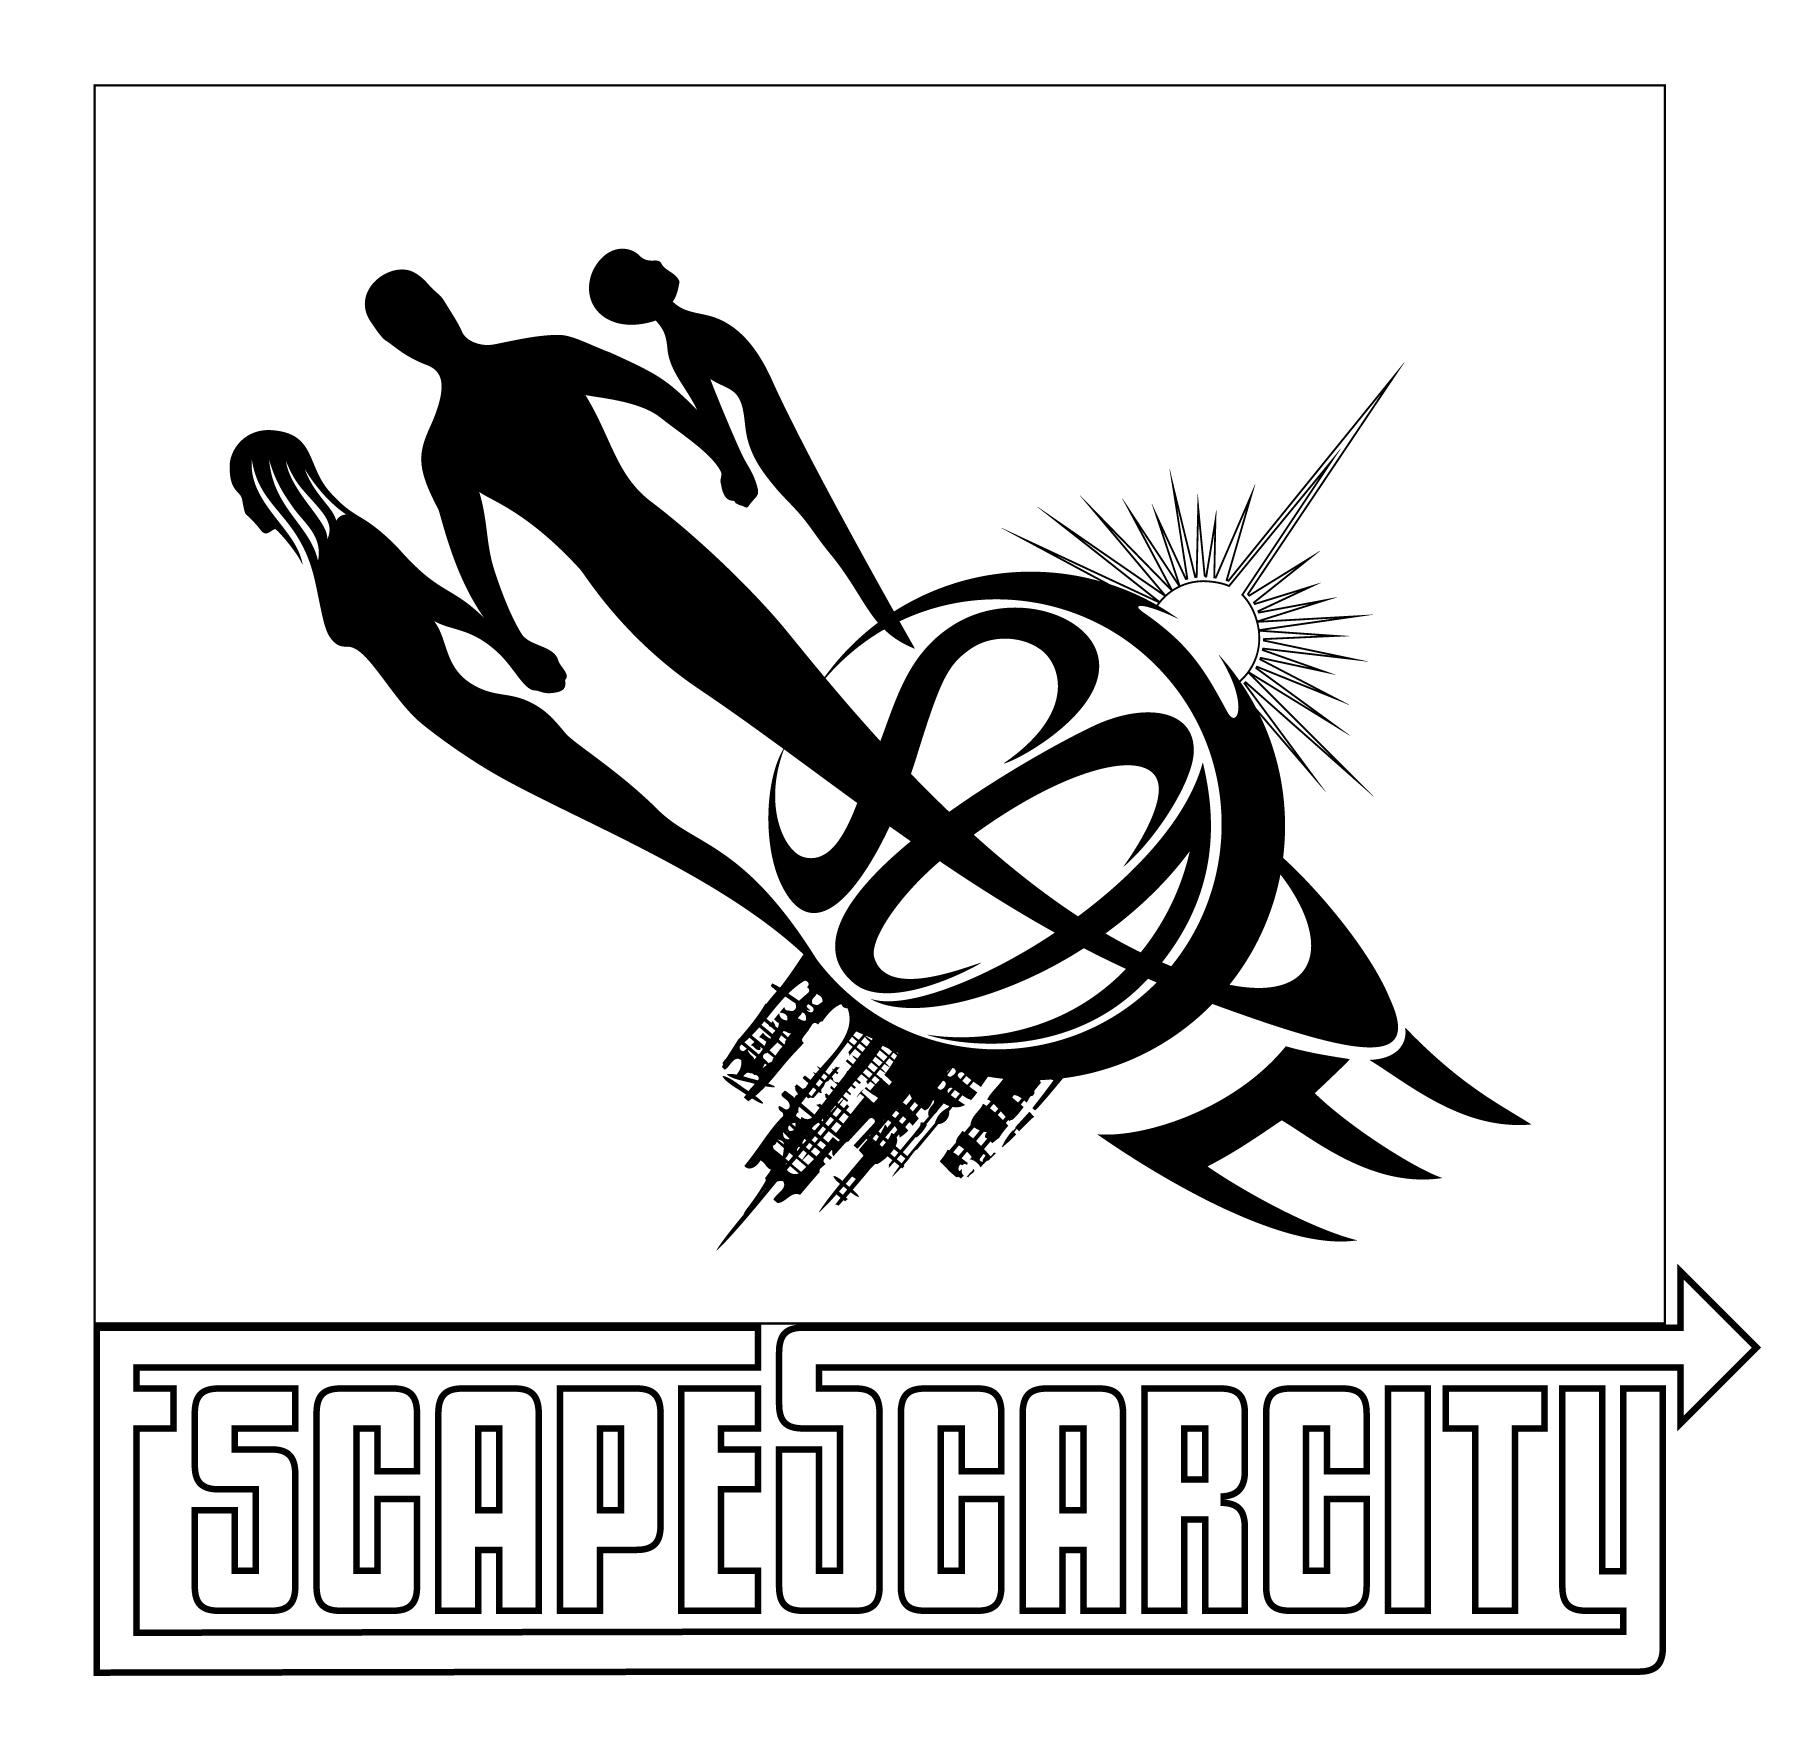 Escape Scarcity